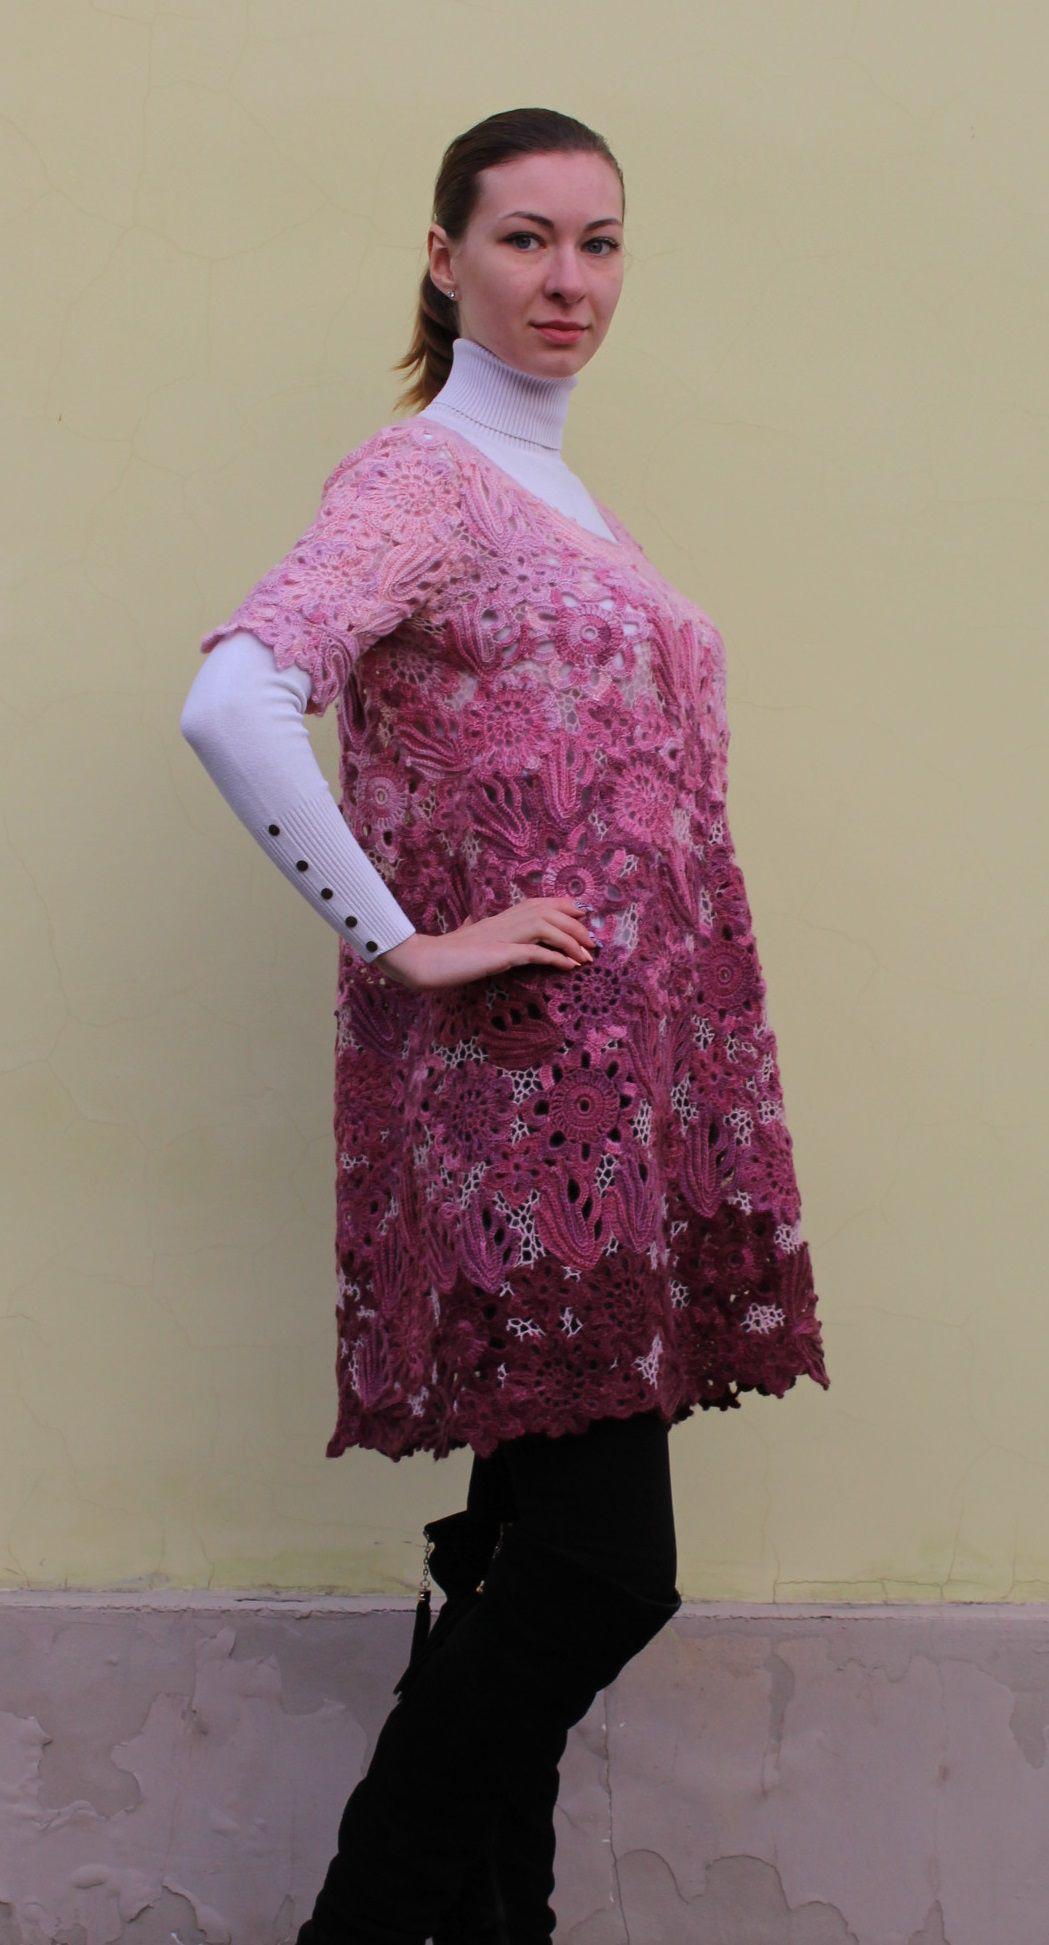 violet clothes knitting dress women